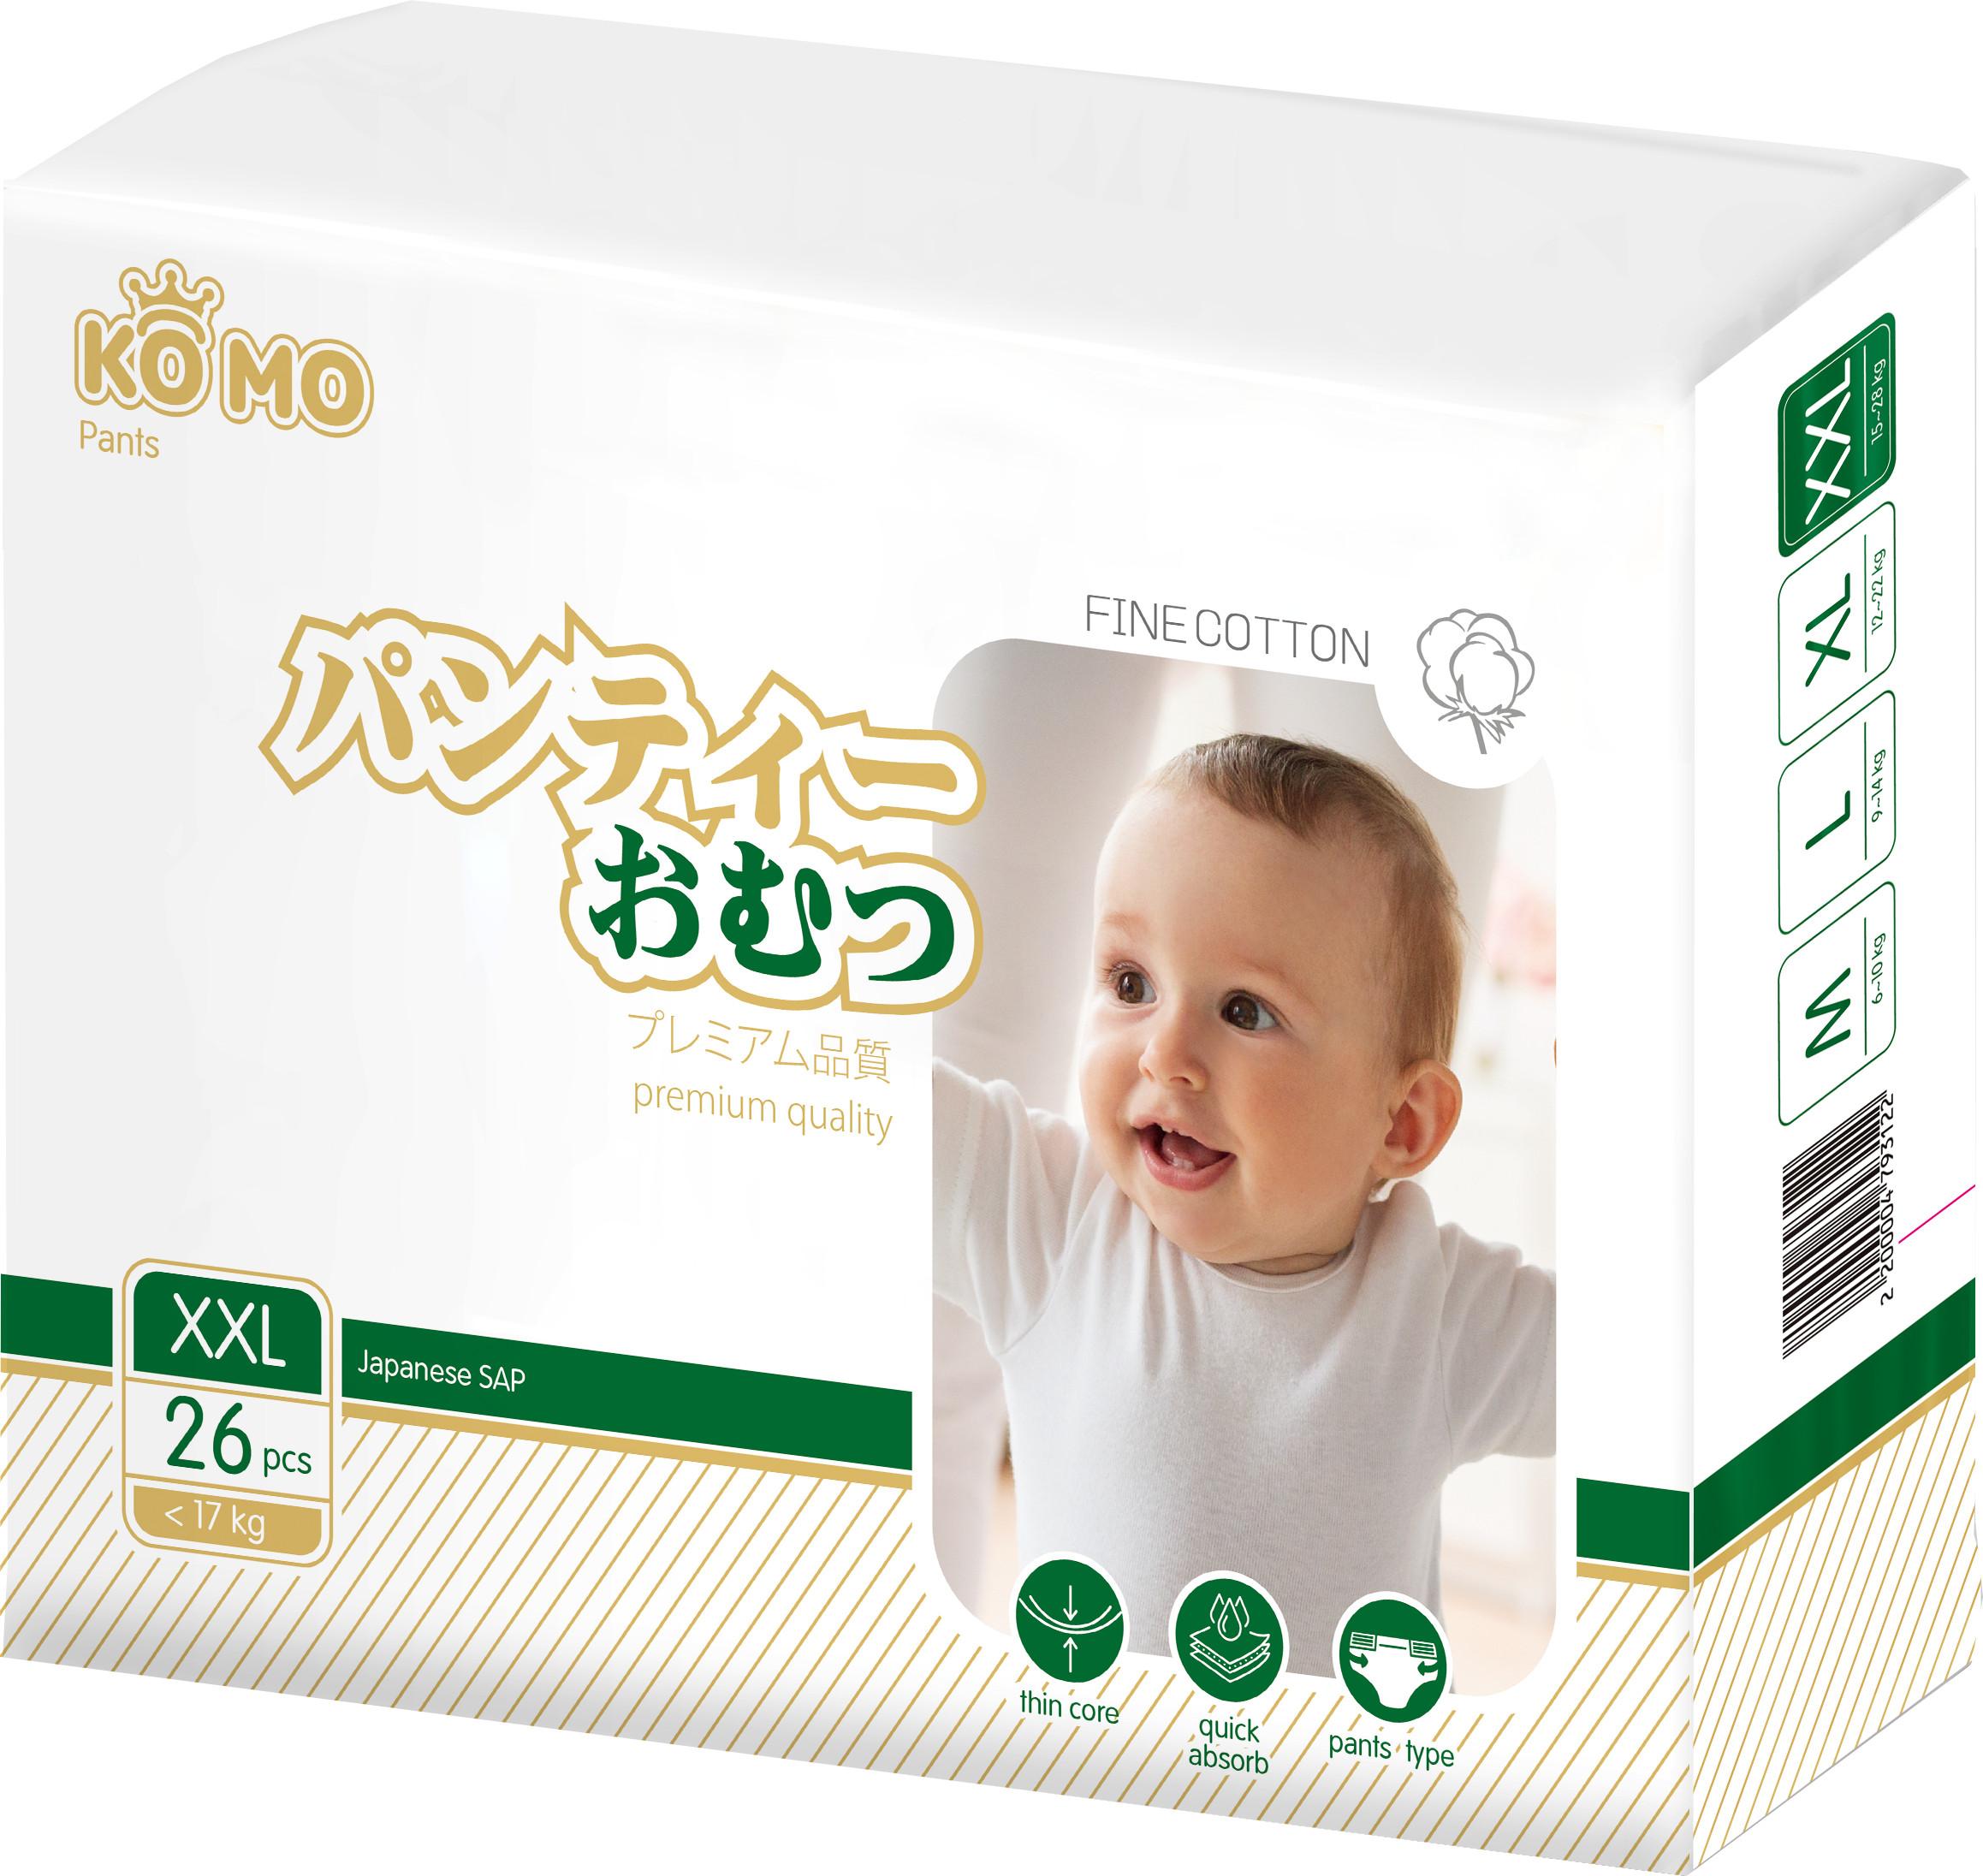 Купить Premium Quality, Трусики-подгузники Ko Mo XXL c 17 кг 26 шт., Подгузники-трусики